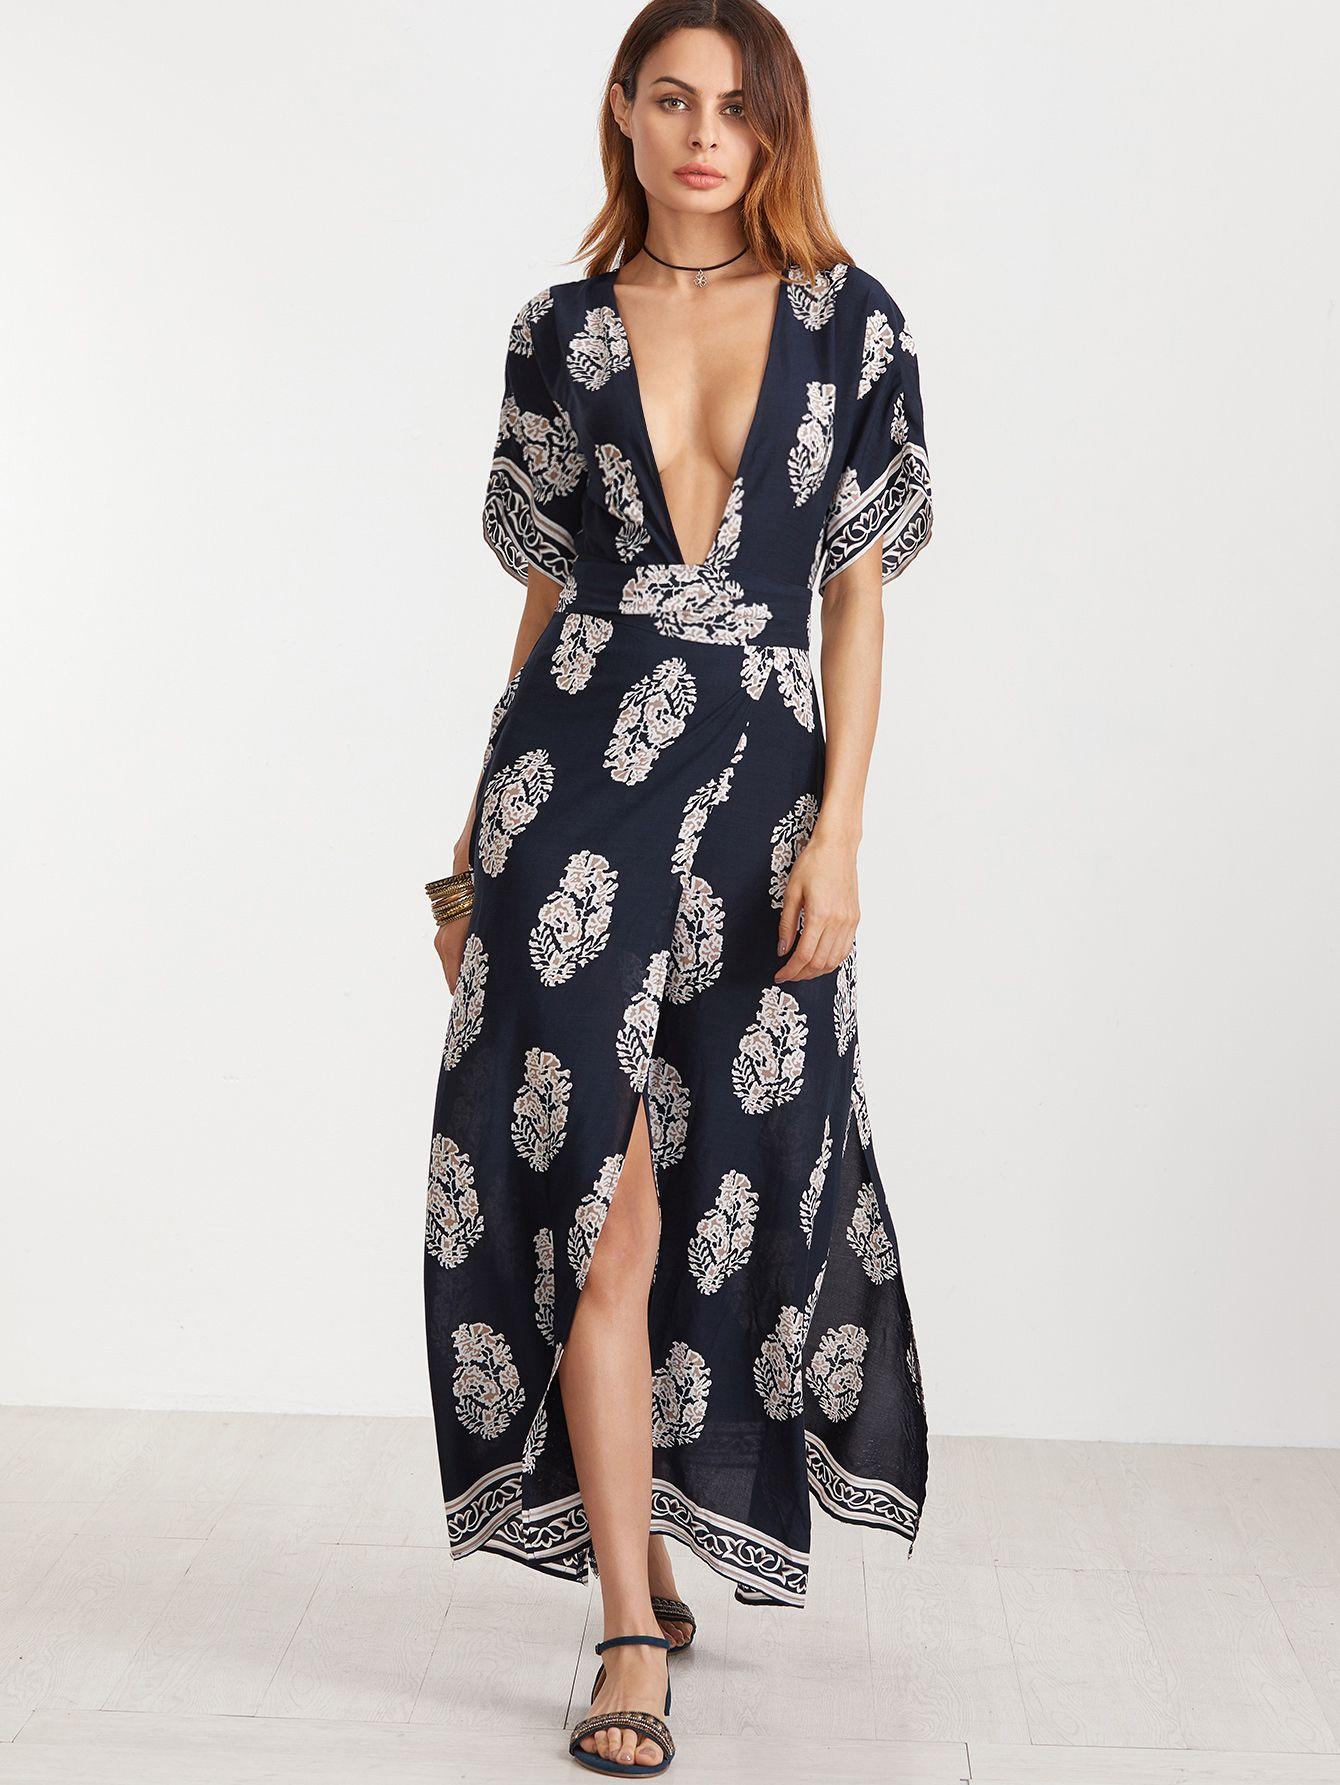 Navy Vintage Print Plunge Neck Open Back Kimono Wrap Dress Vestiti  Avvolgenti 96fe07652